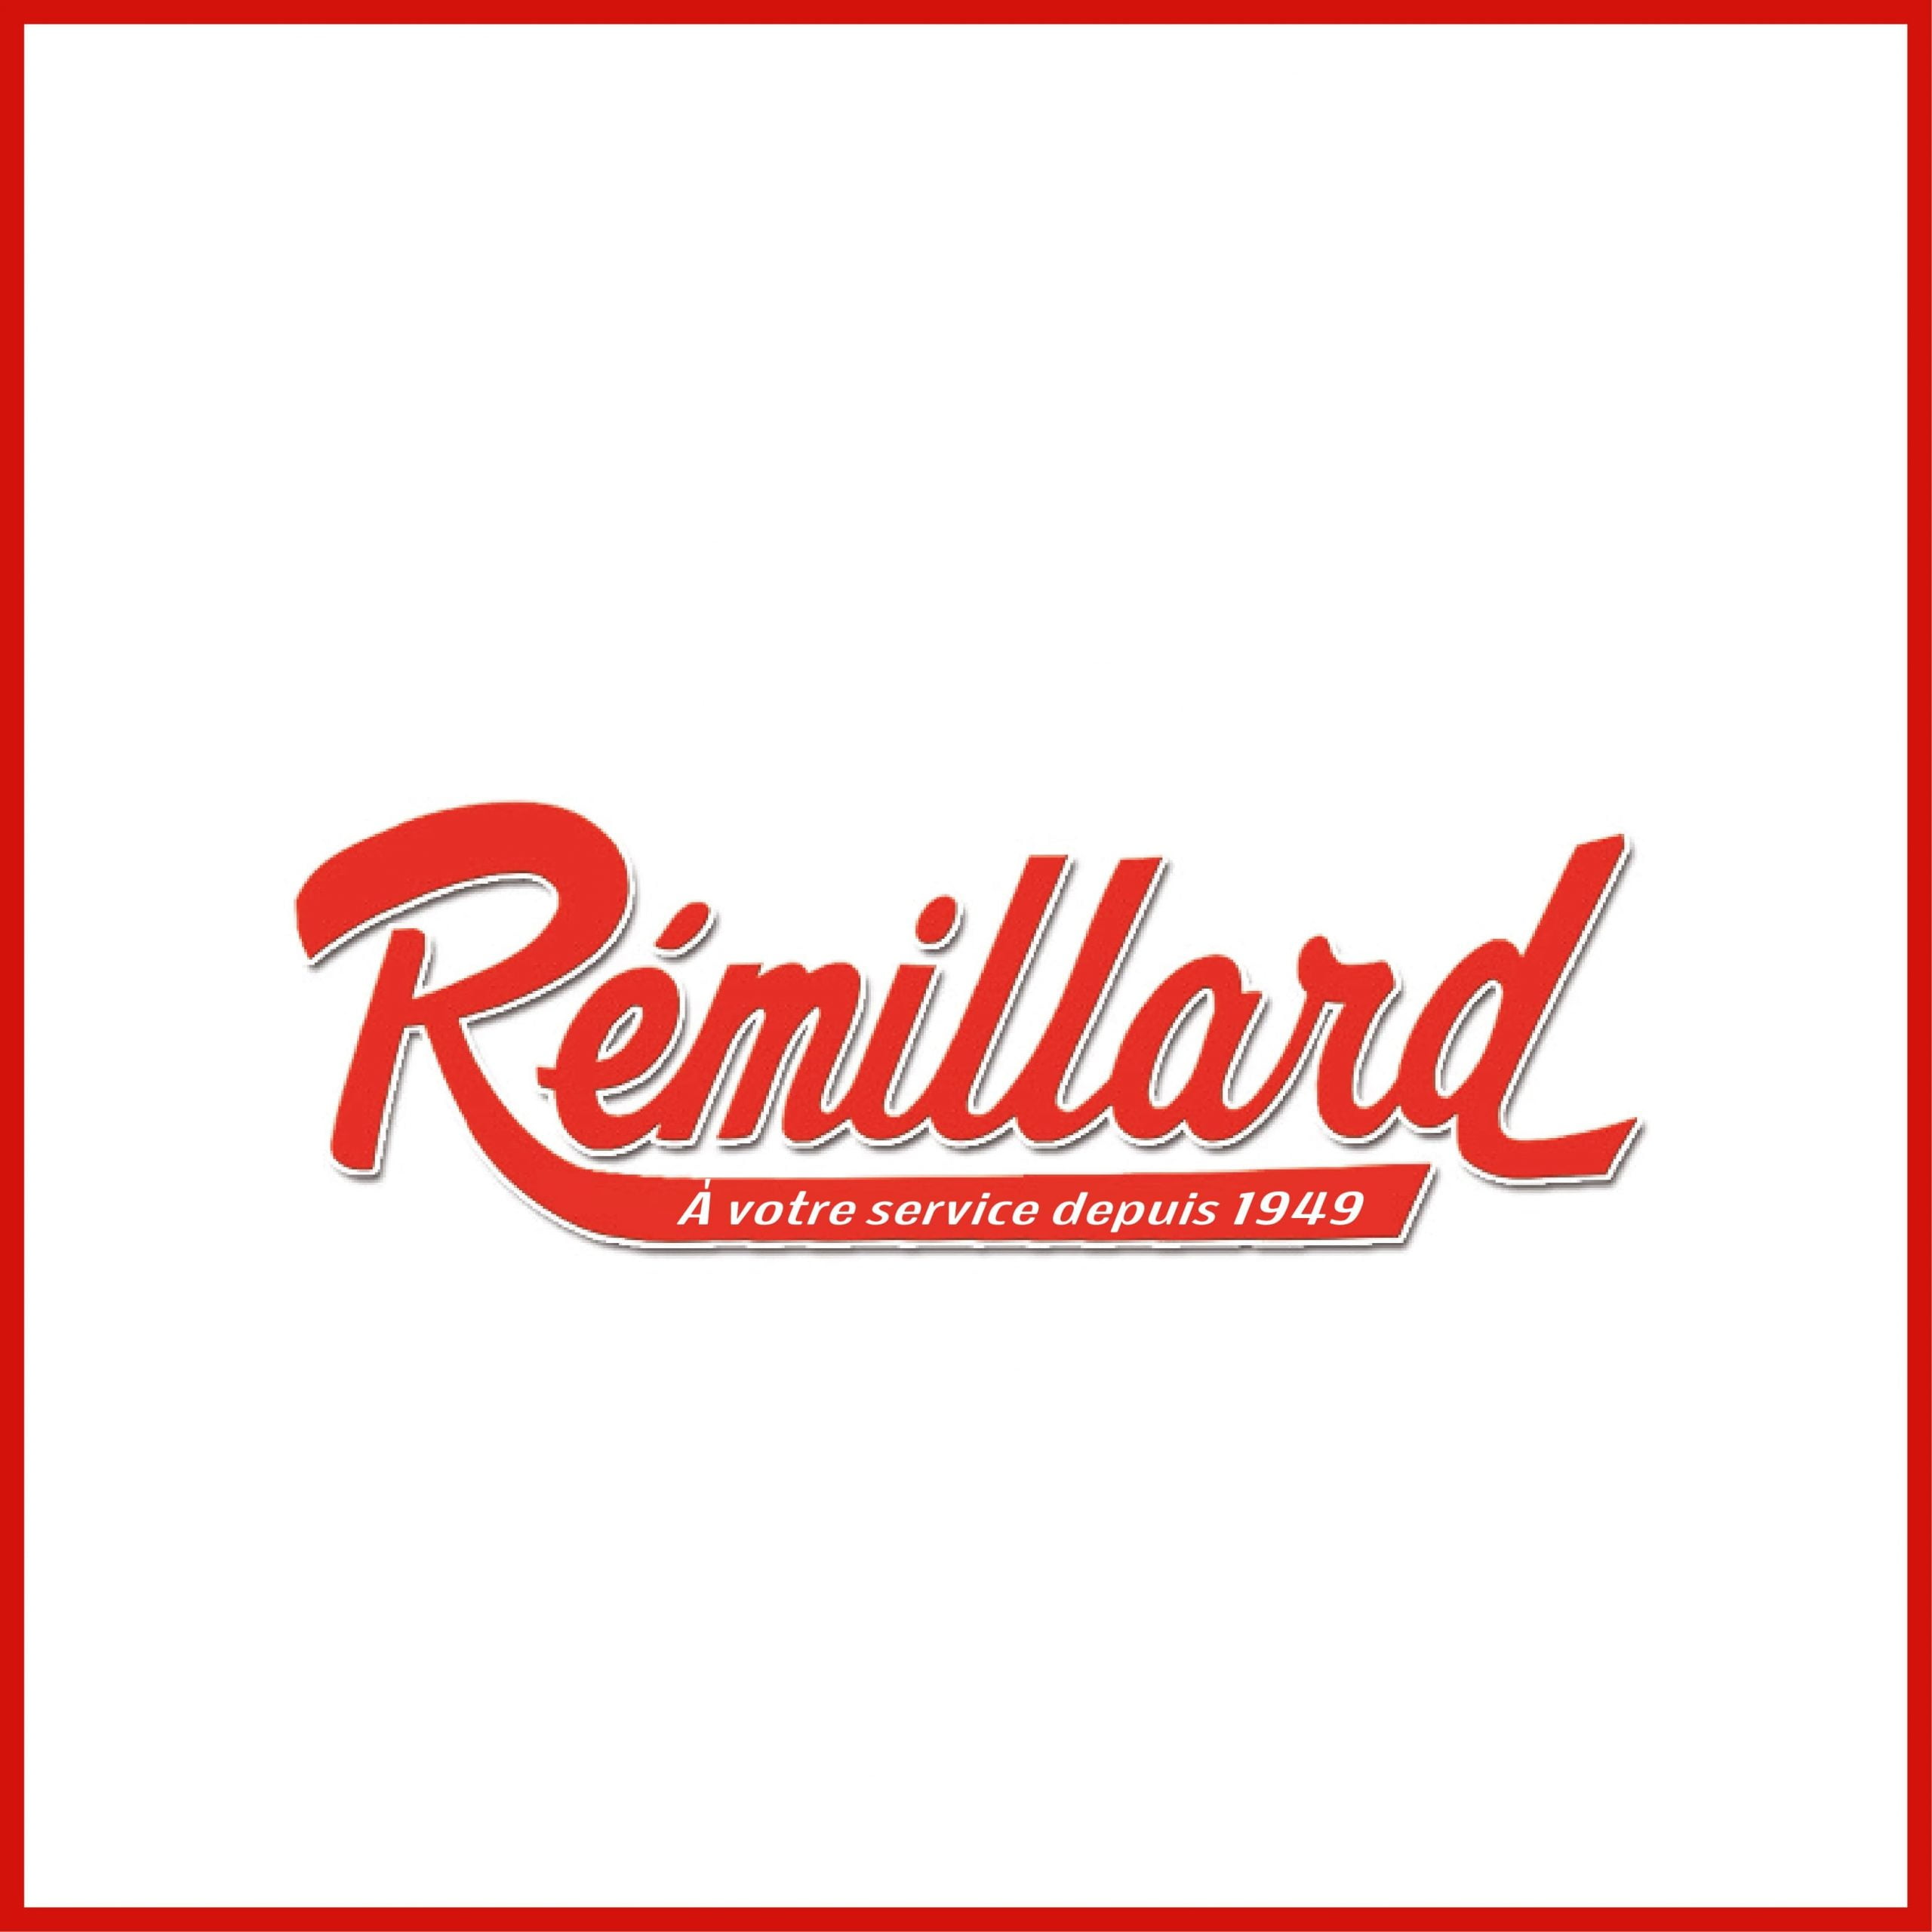 Maison Rémillard - Modernisation de logo